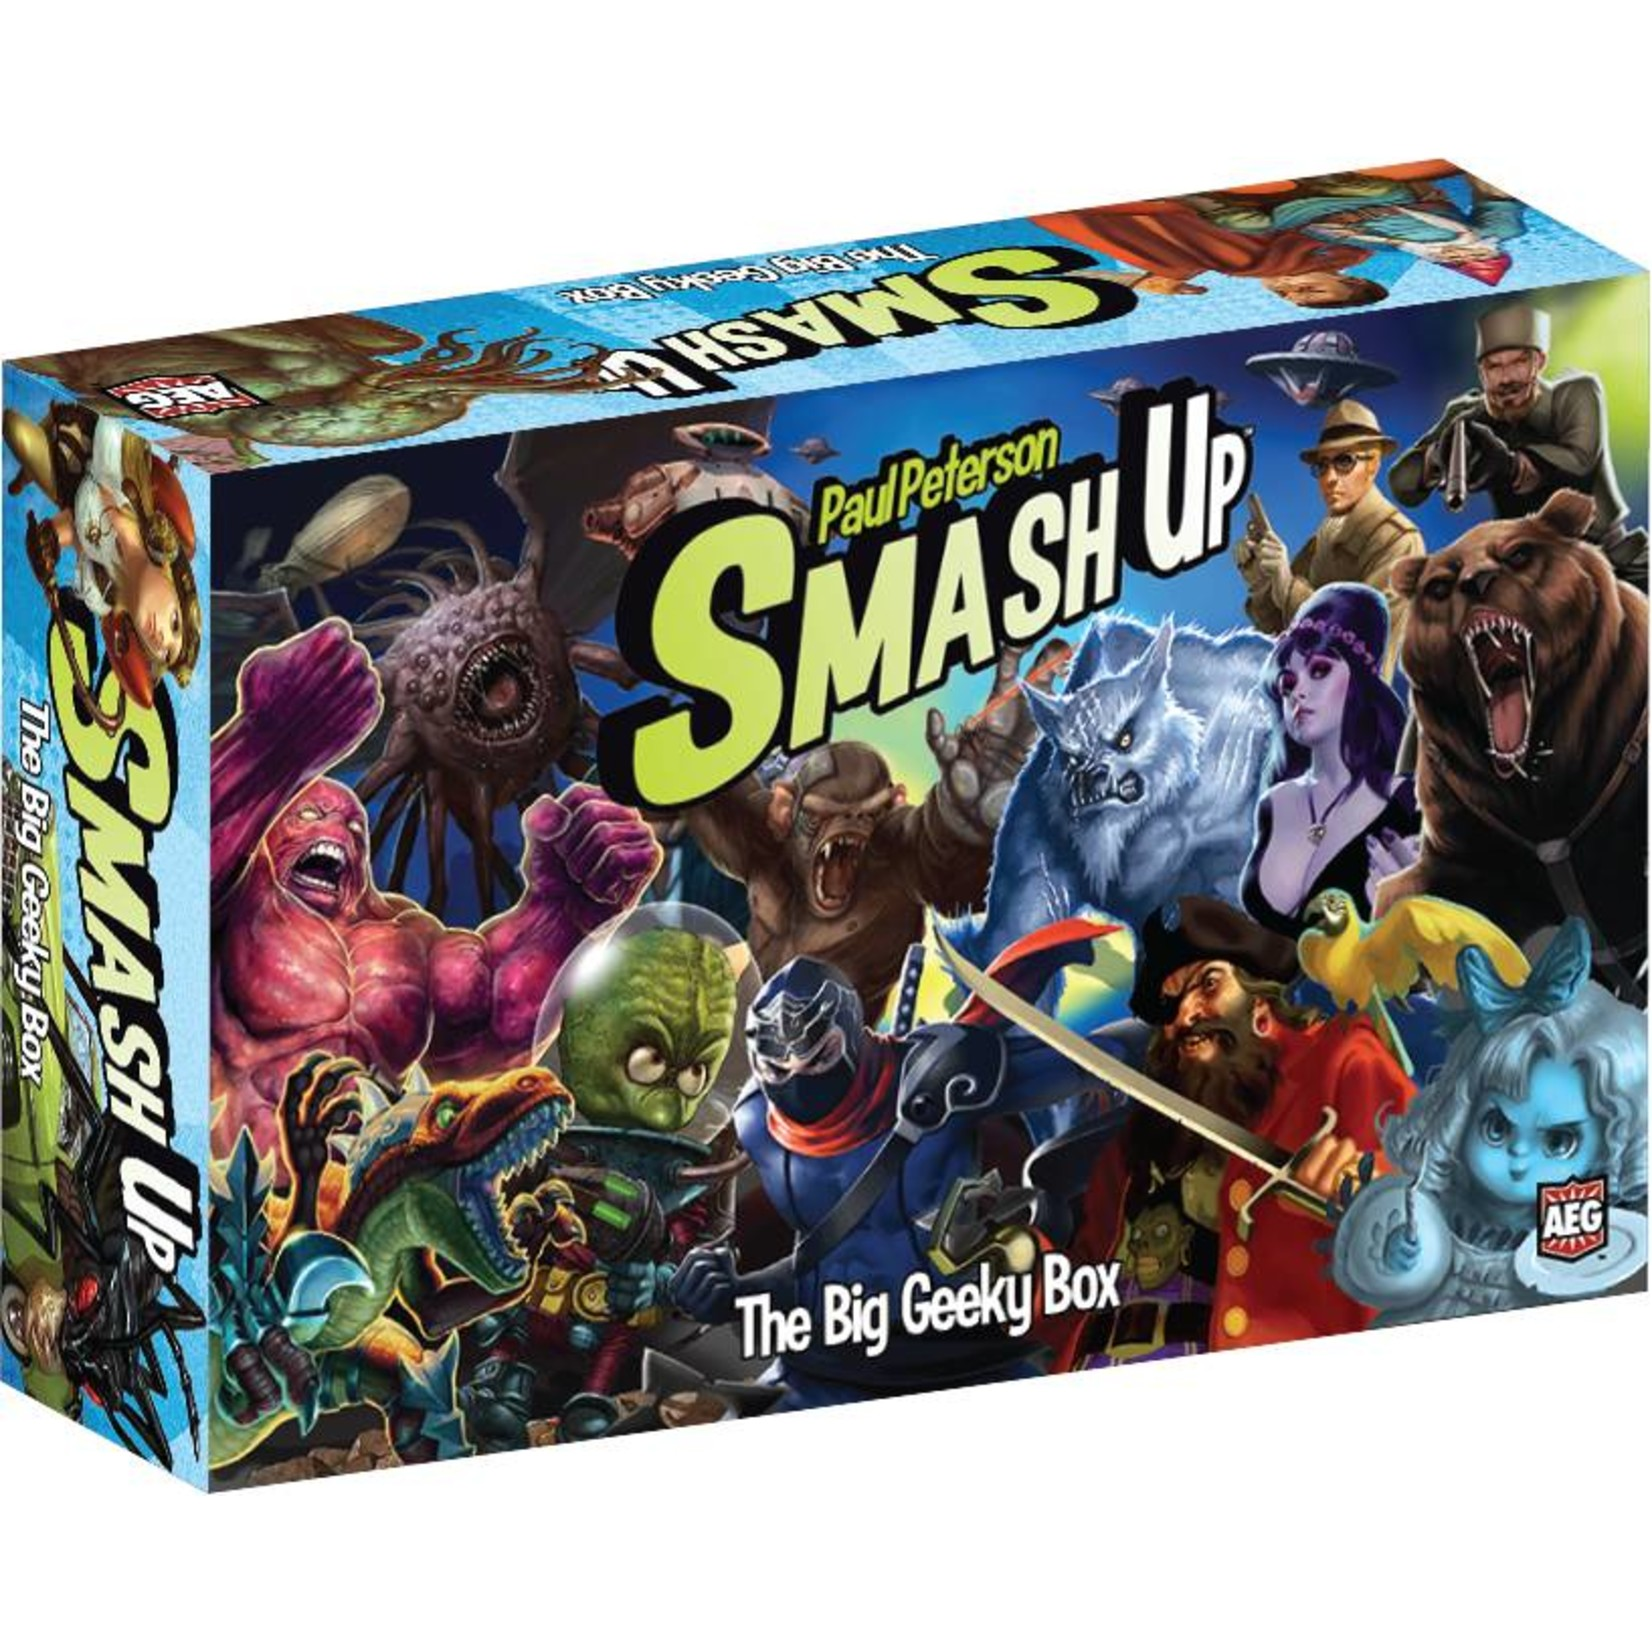 AEG Smash Up! Big Geeky Box Expansion